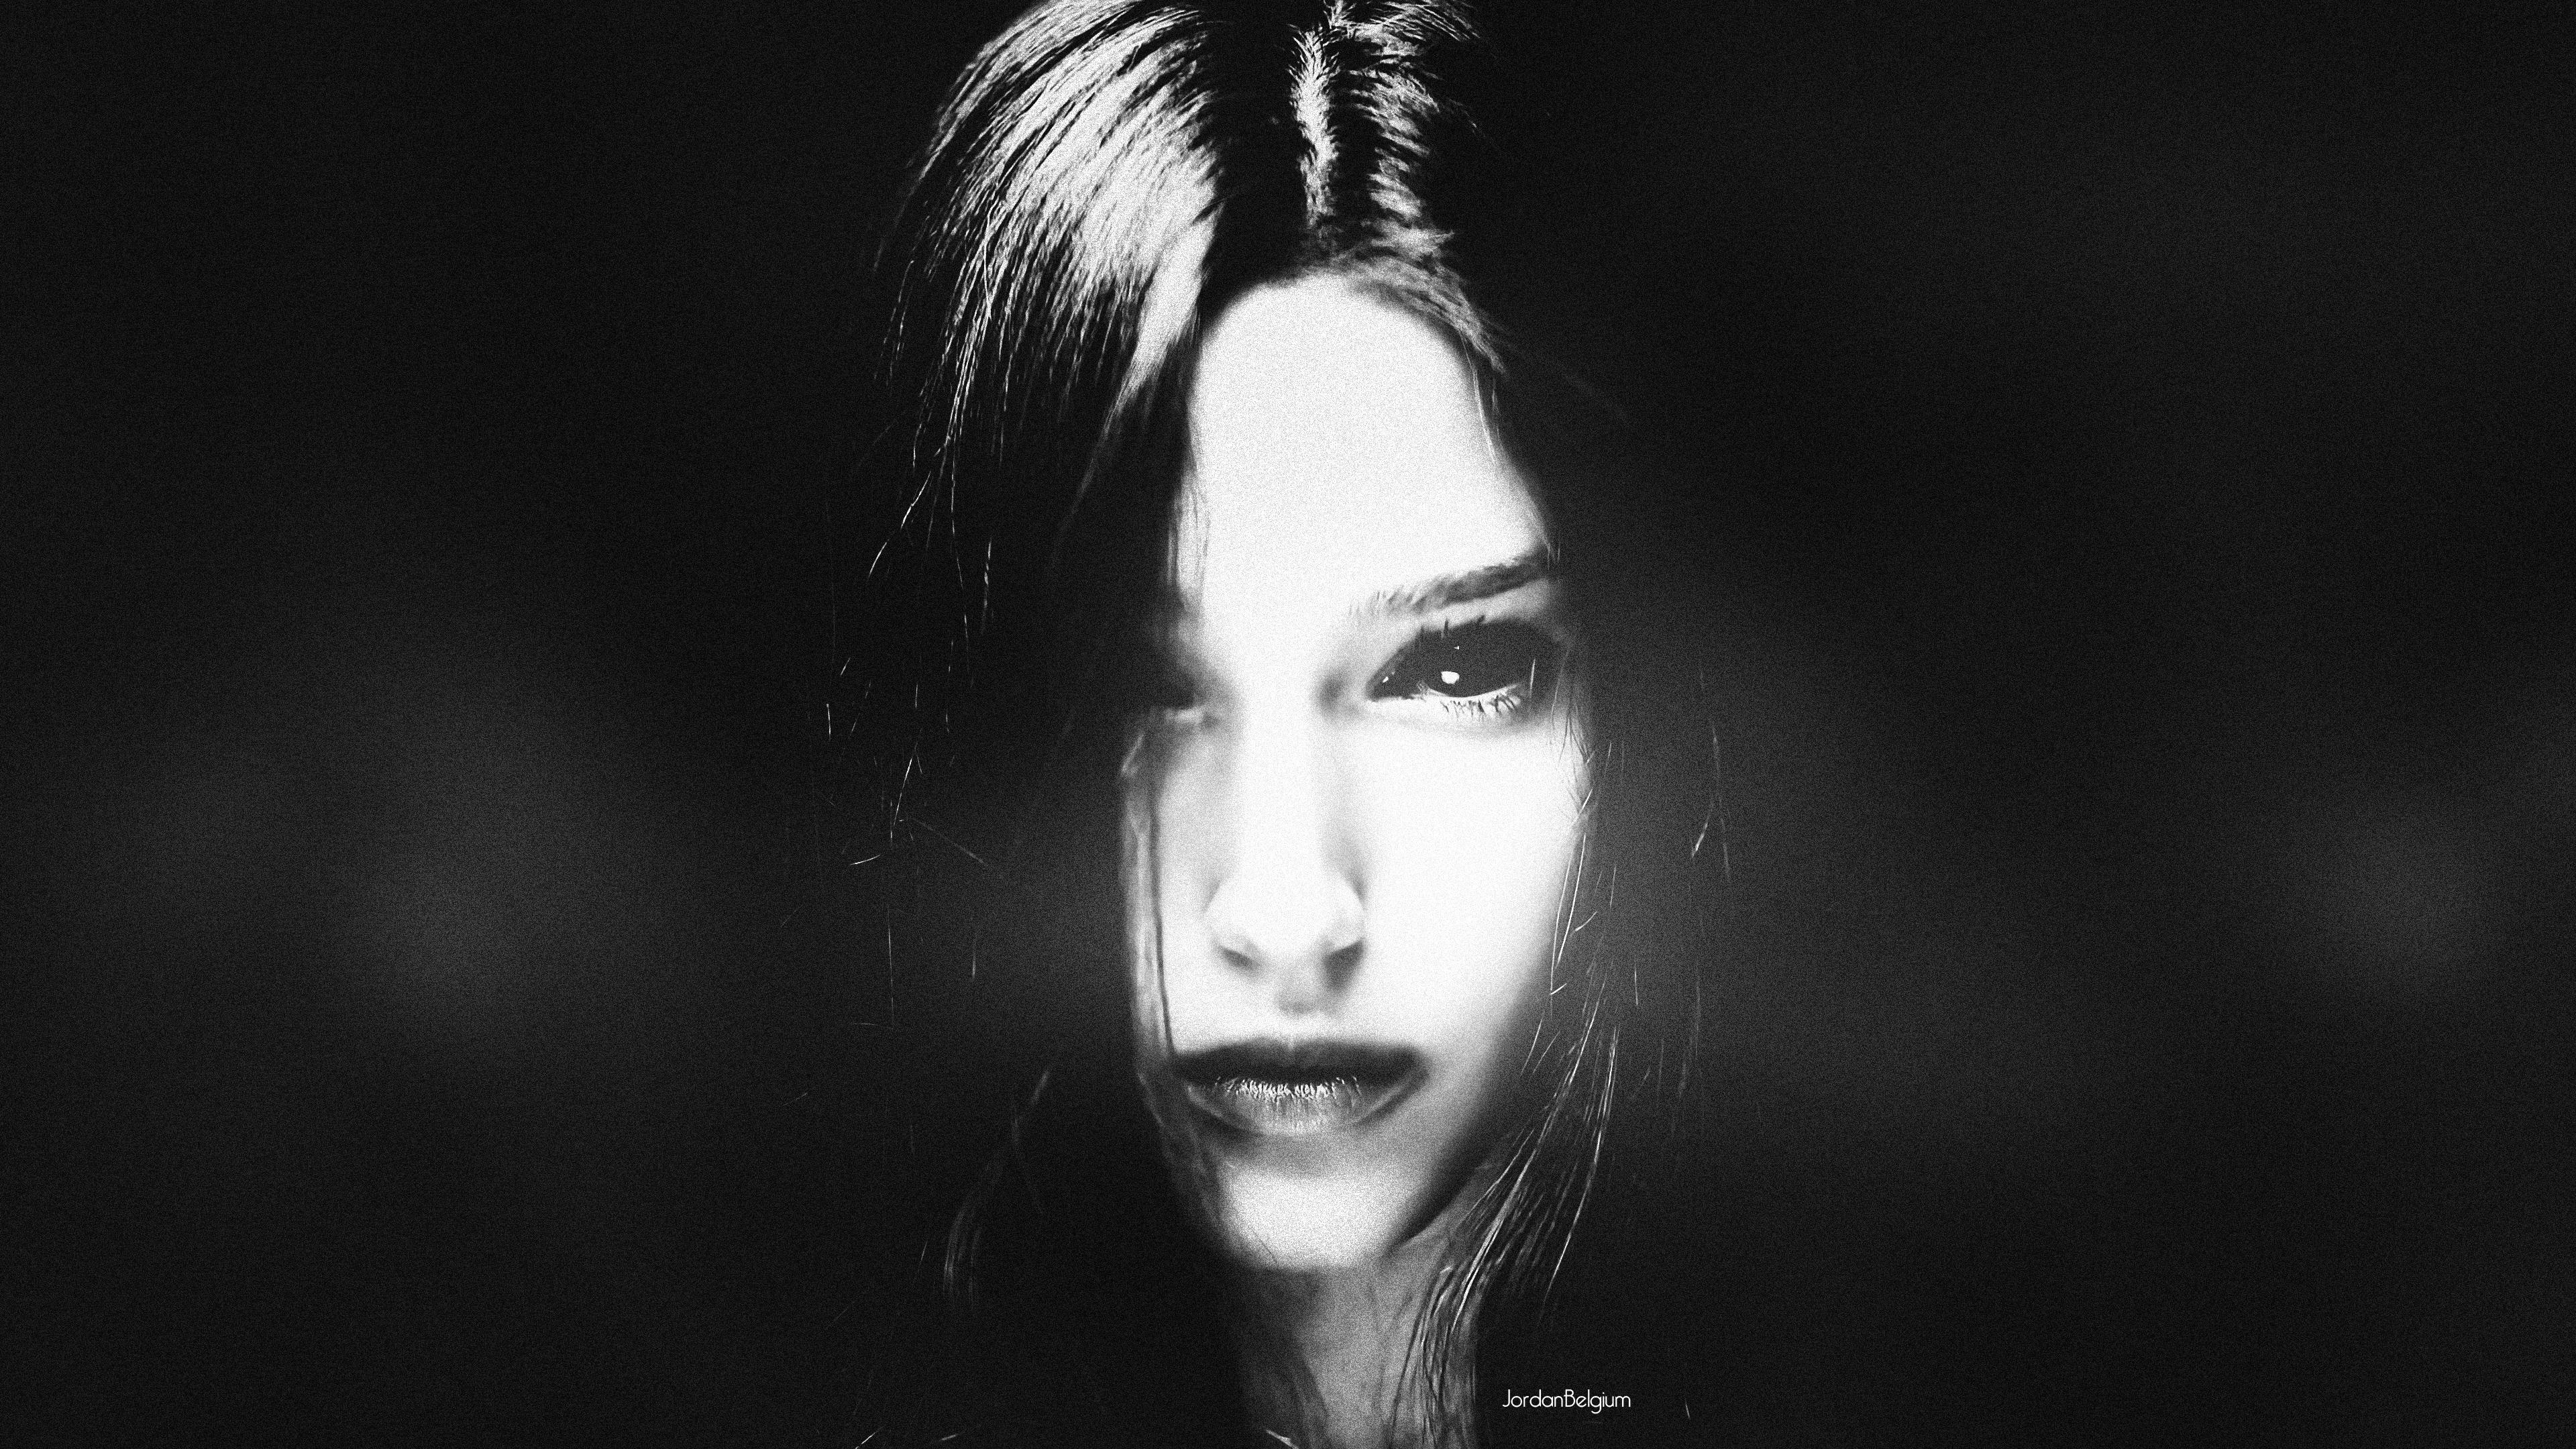 Wallpaper face photoshop women model simple background horror